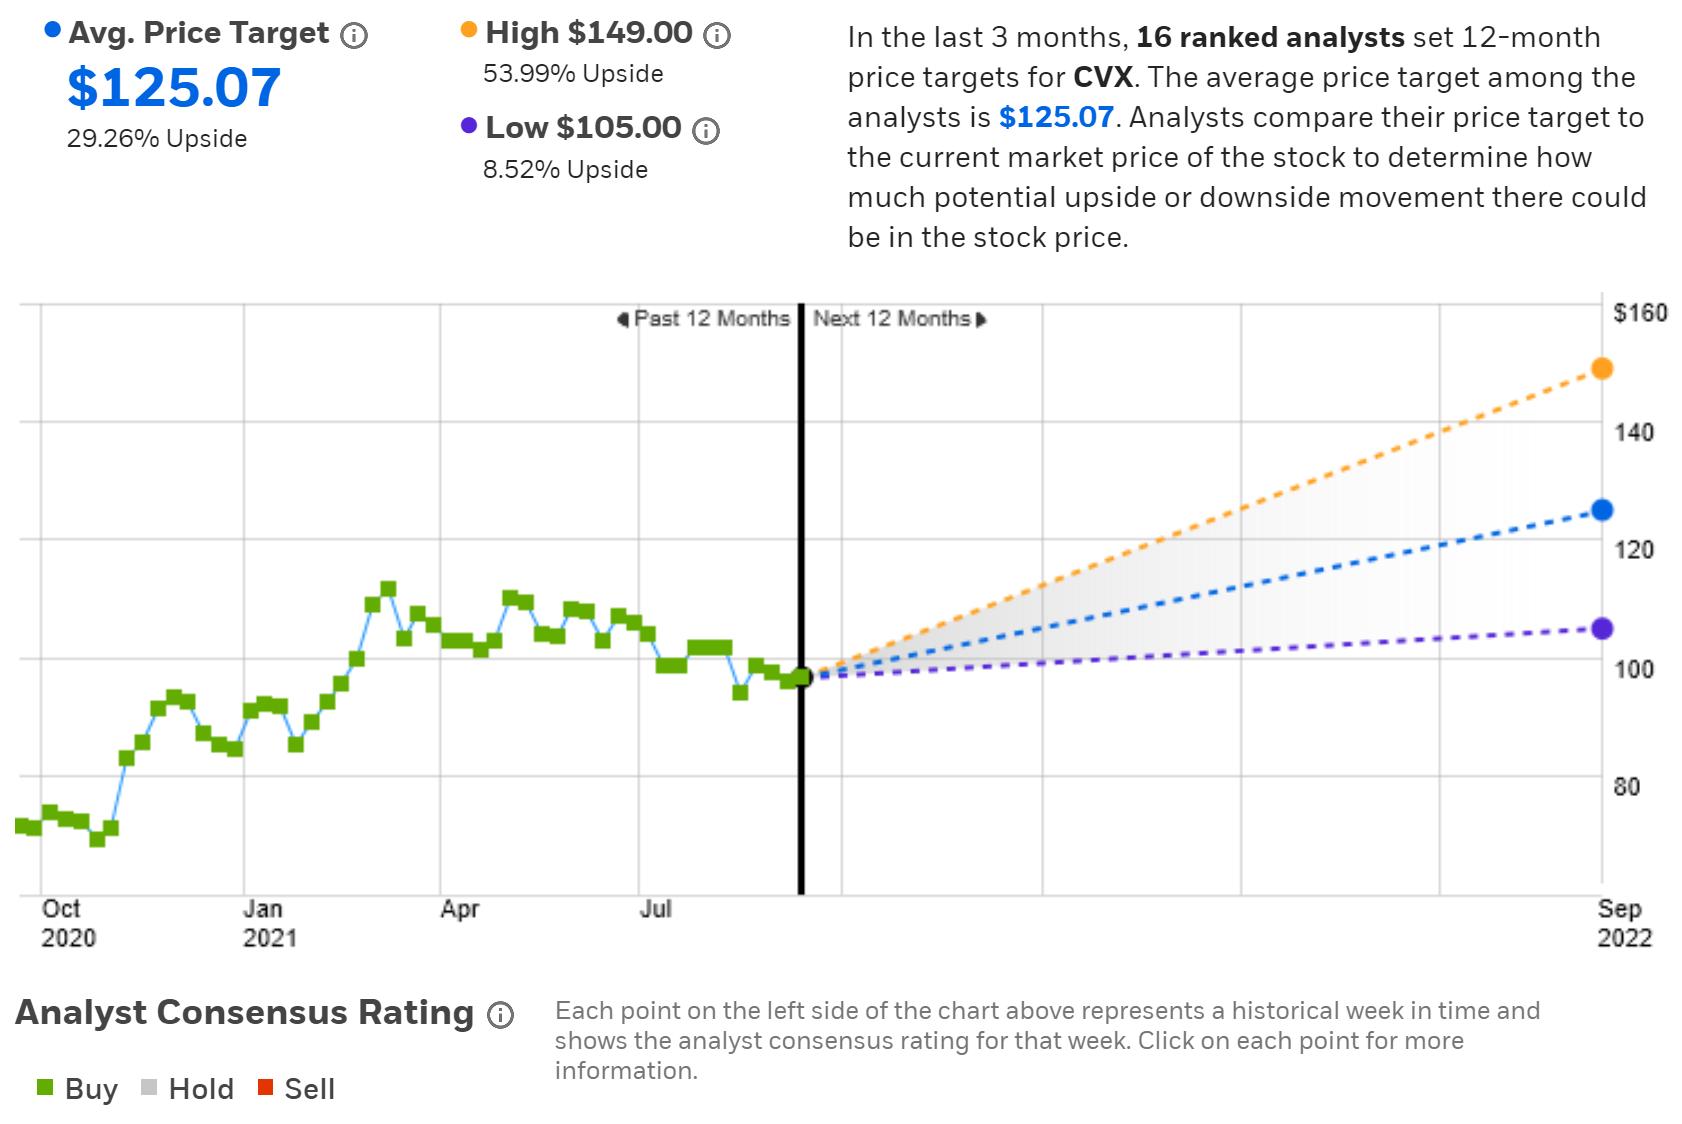 (CVX華爾街共識評級及12個月目標價來自eTrade)